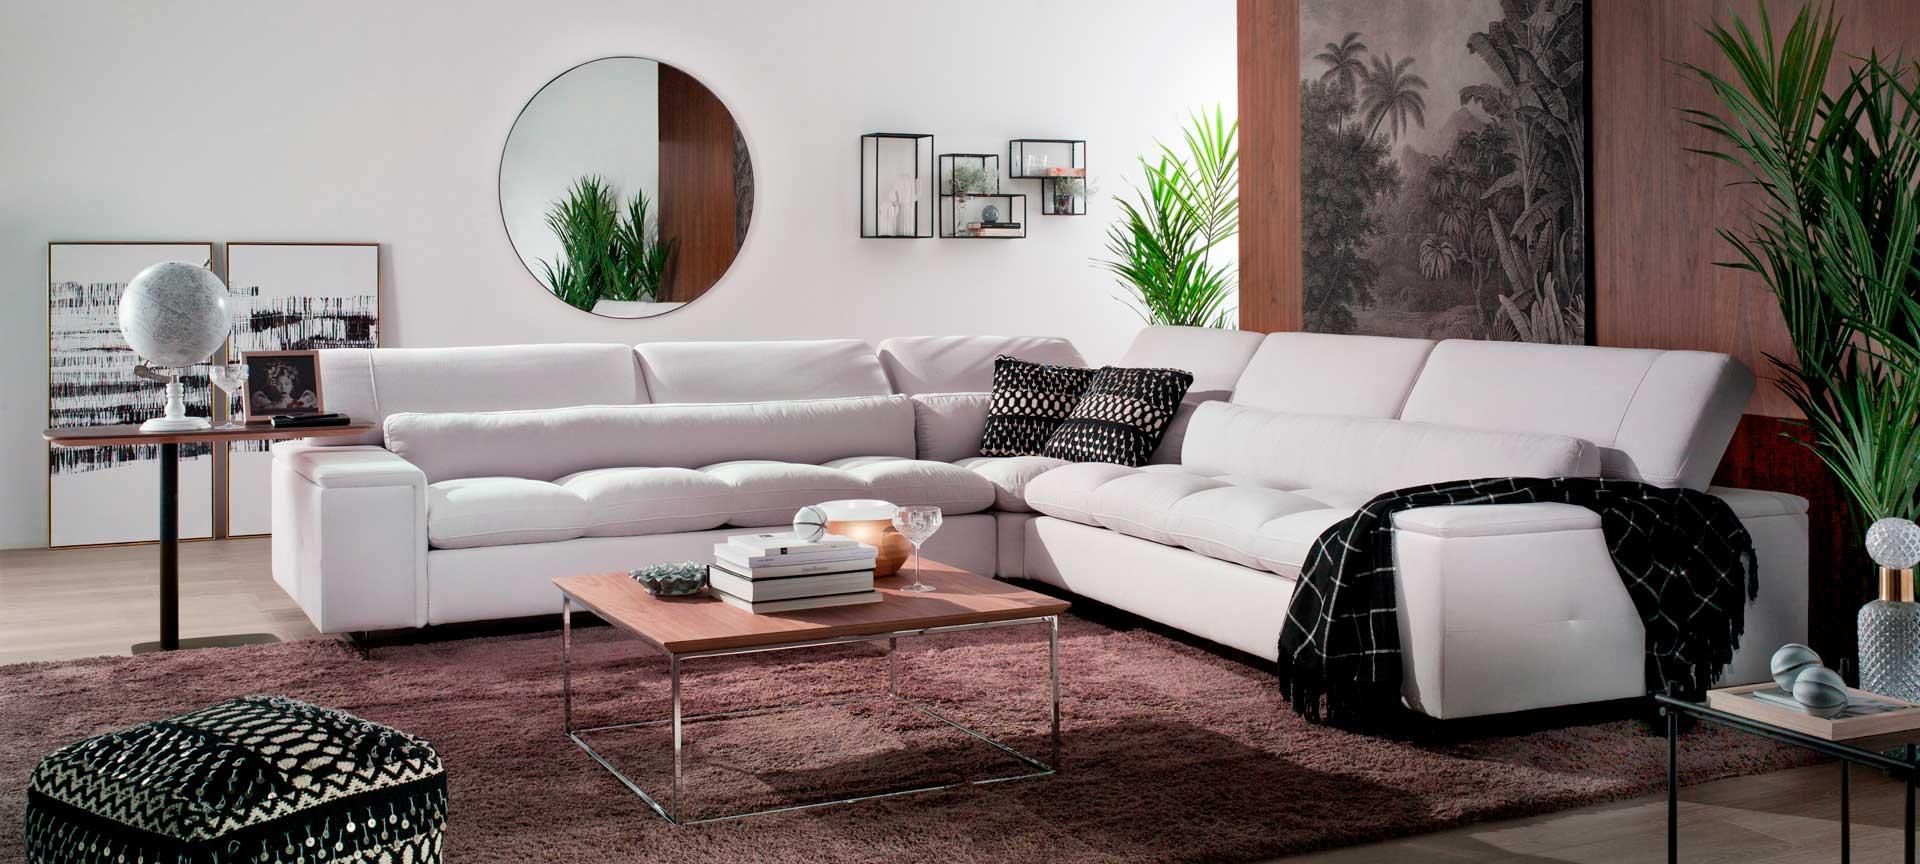 sofa esquinero blanco cianita